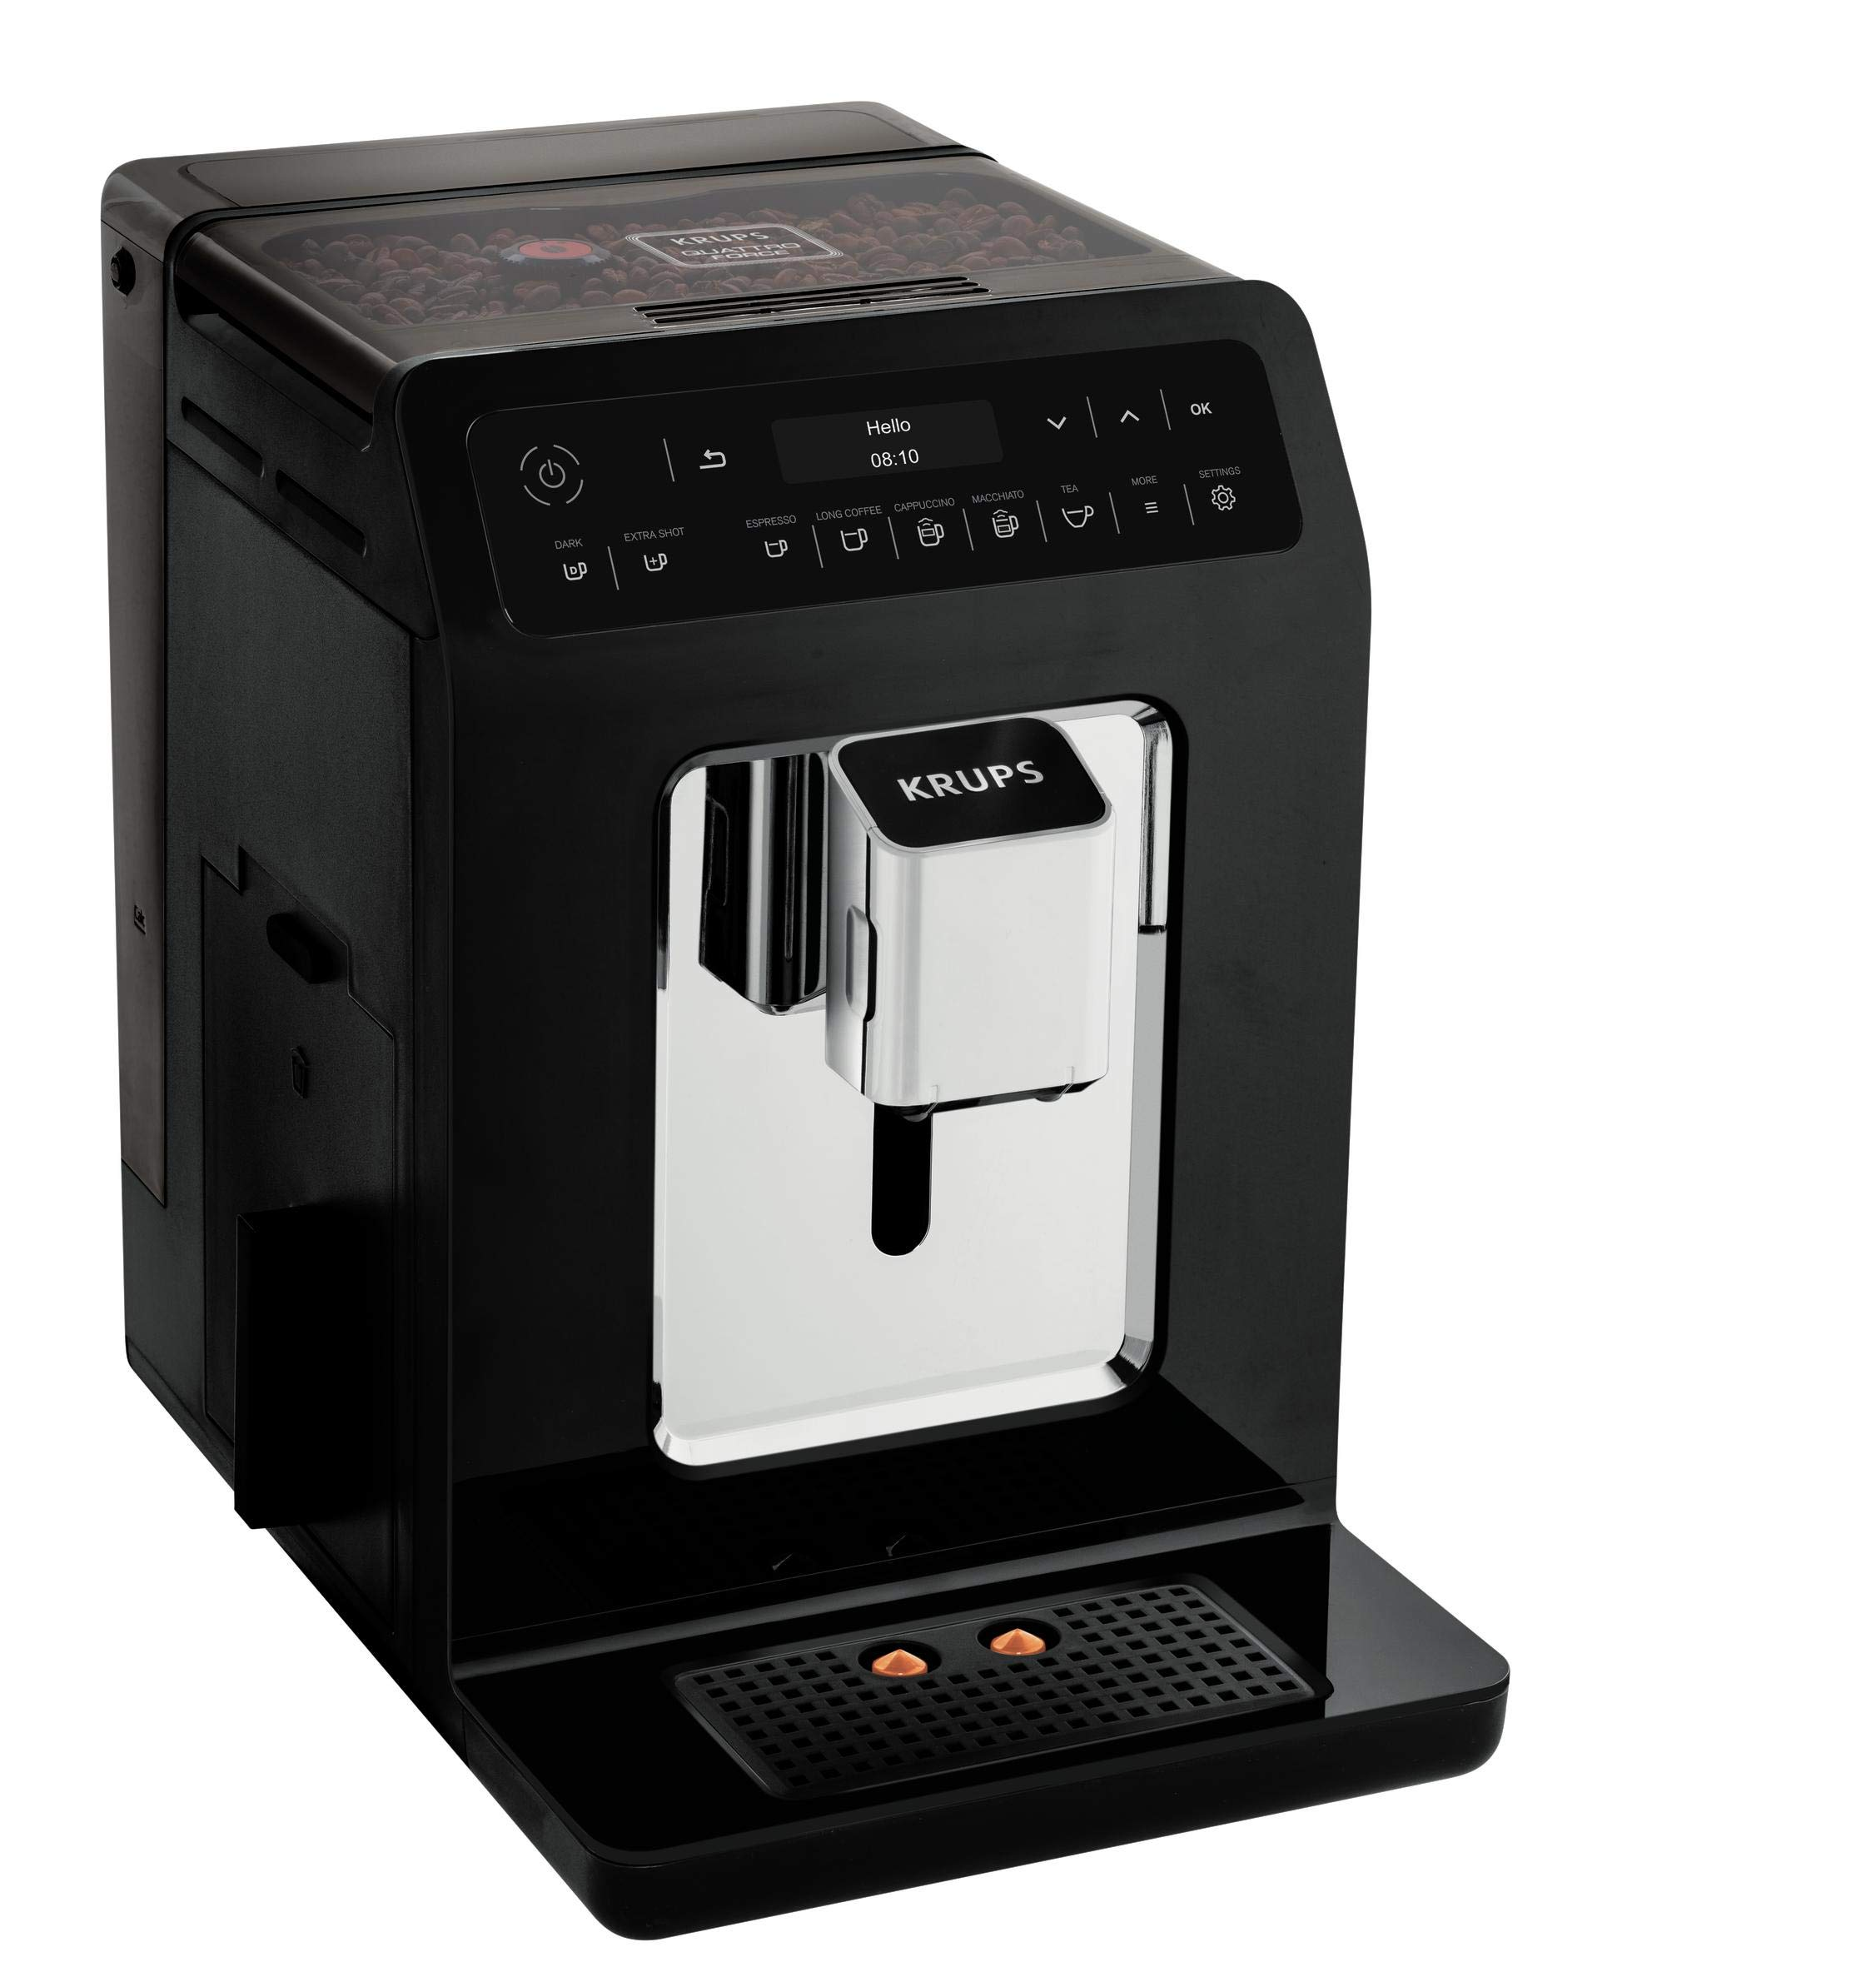 Krups-Evidence-EA8908-Kaffeevollautomat-1450-23-liters-SchwarzChrome